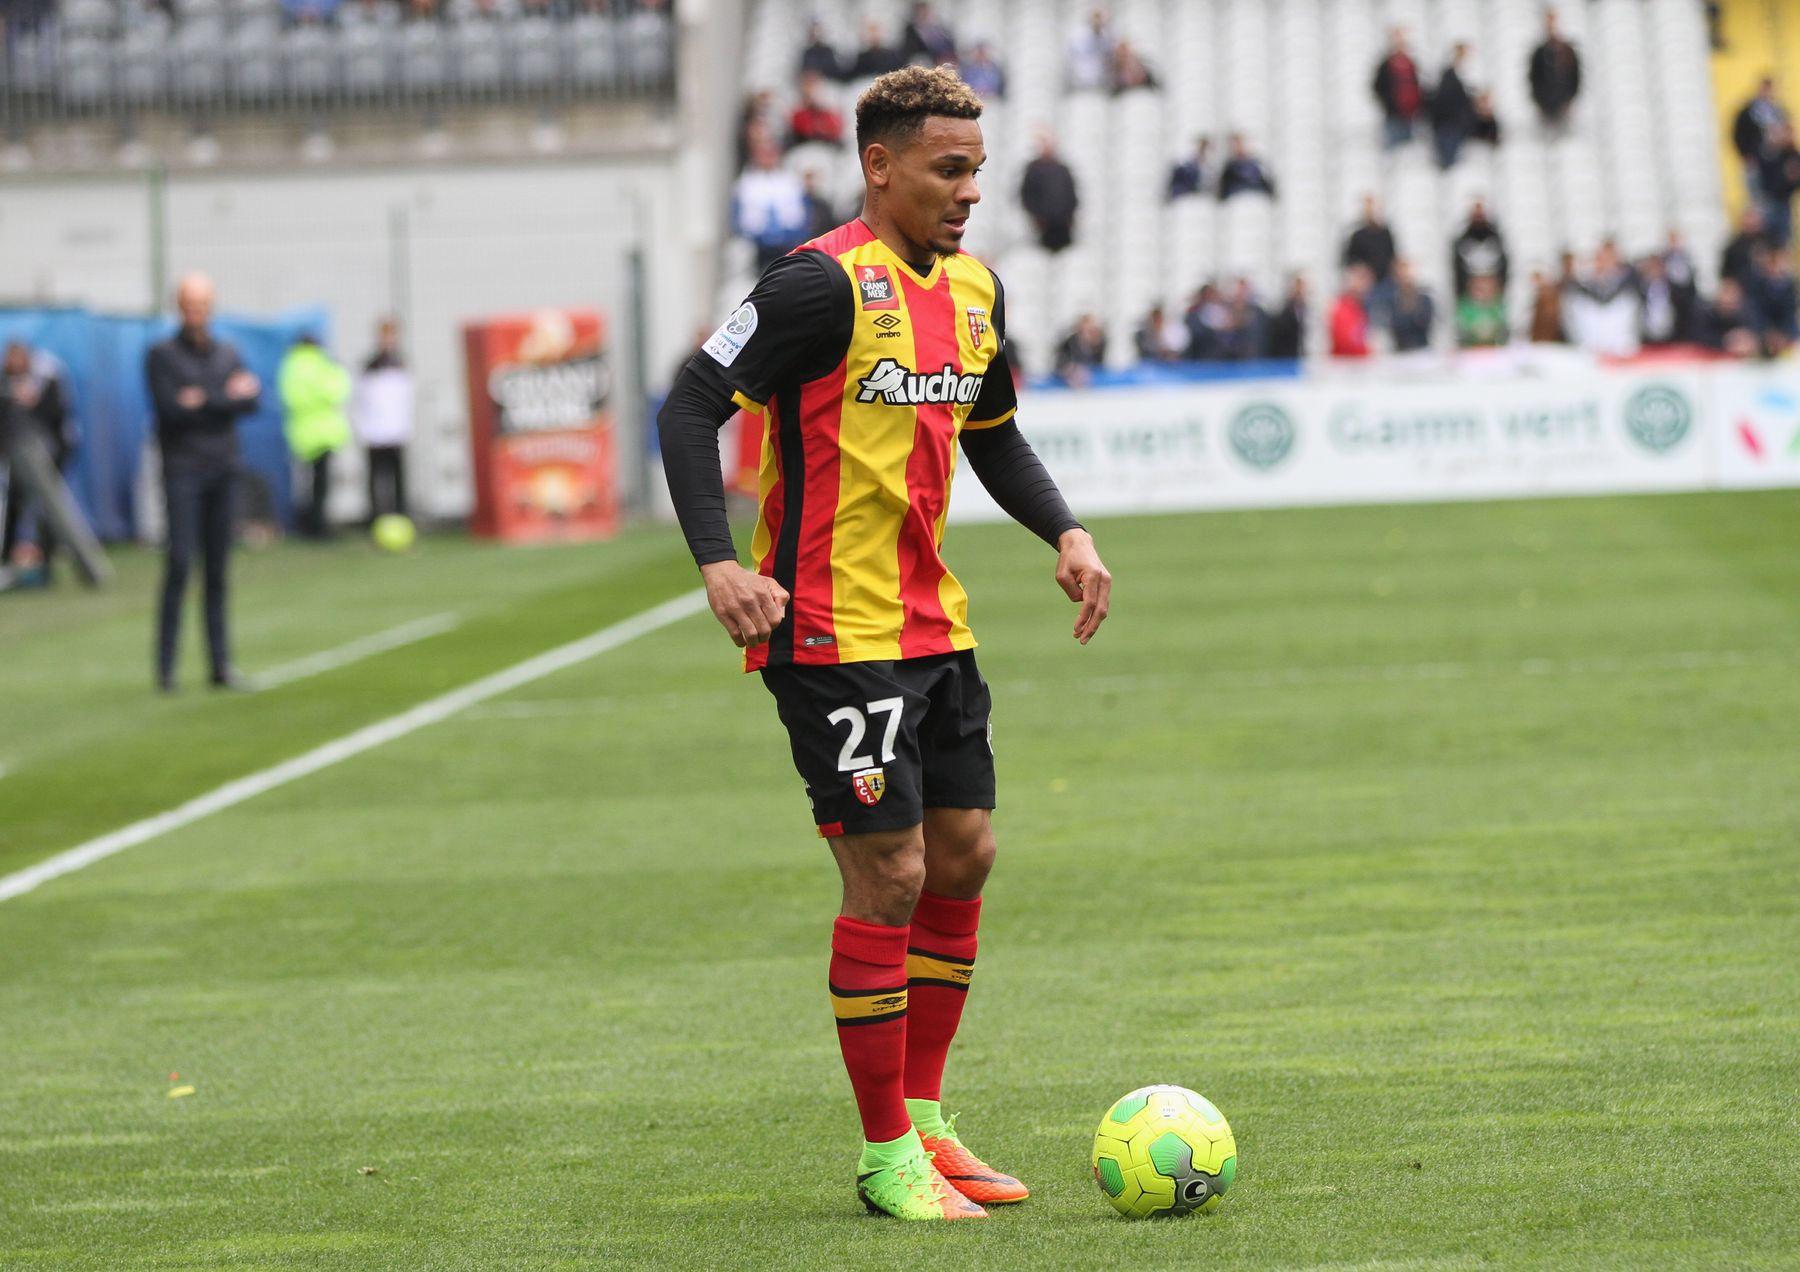 Football - Ligue 2 - Le Havre-Lens en direct